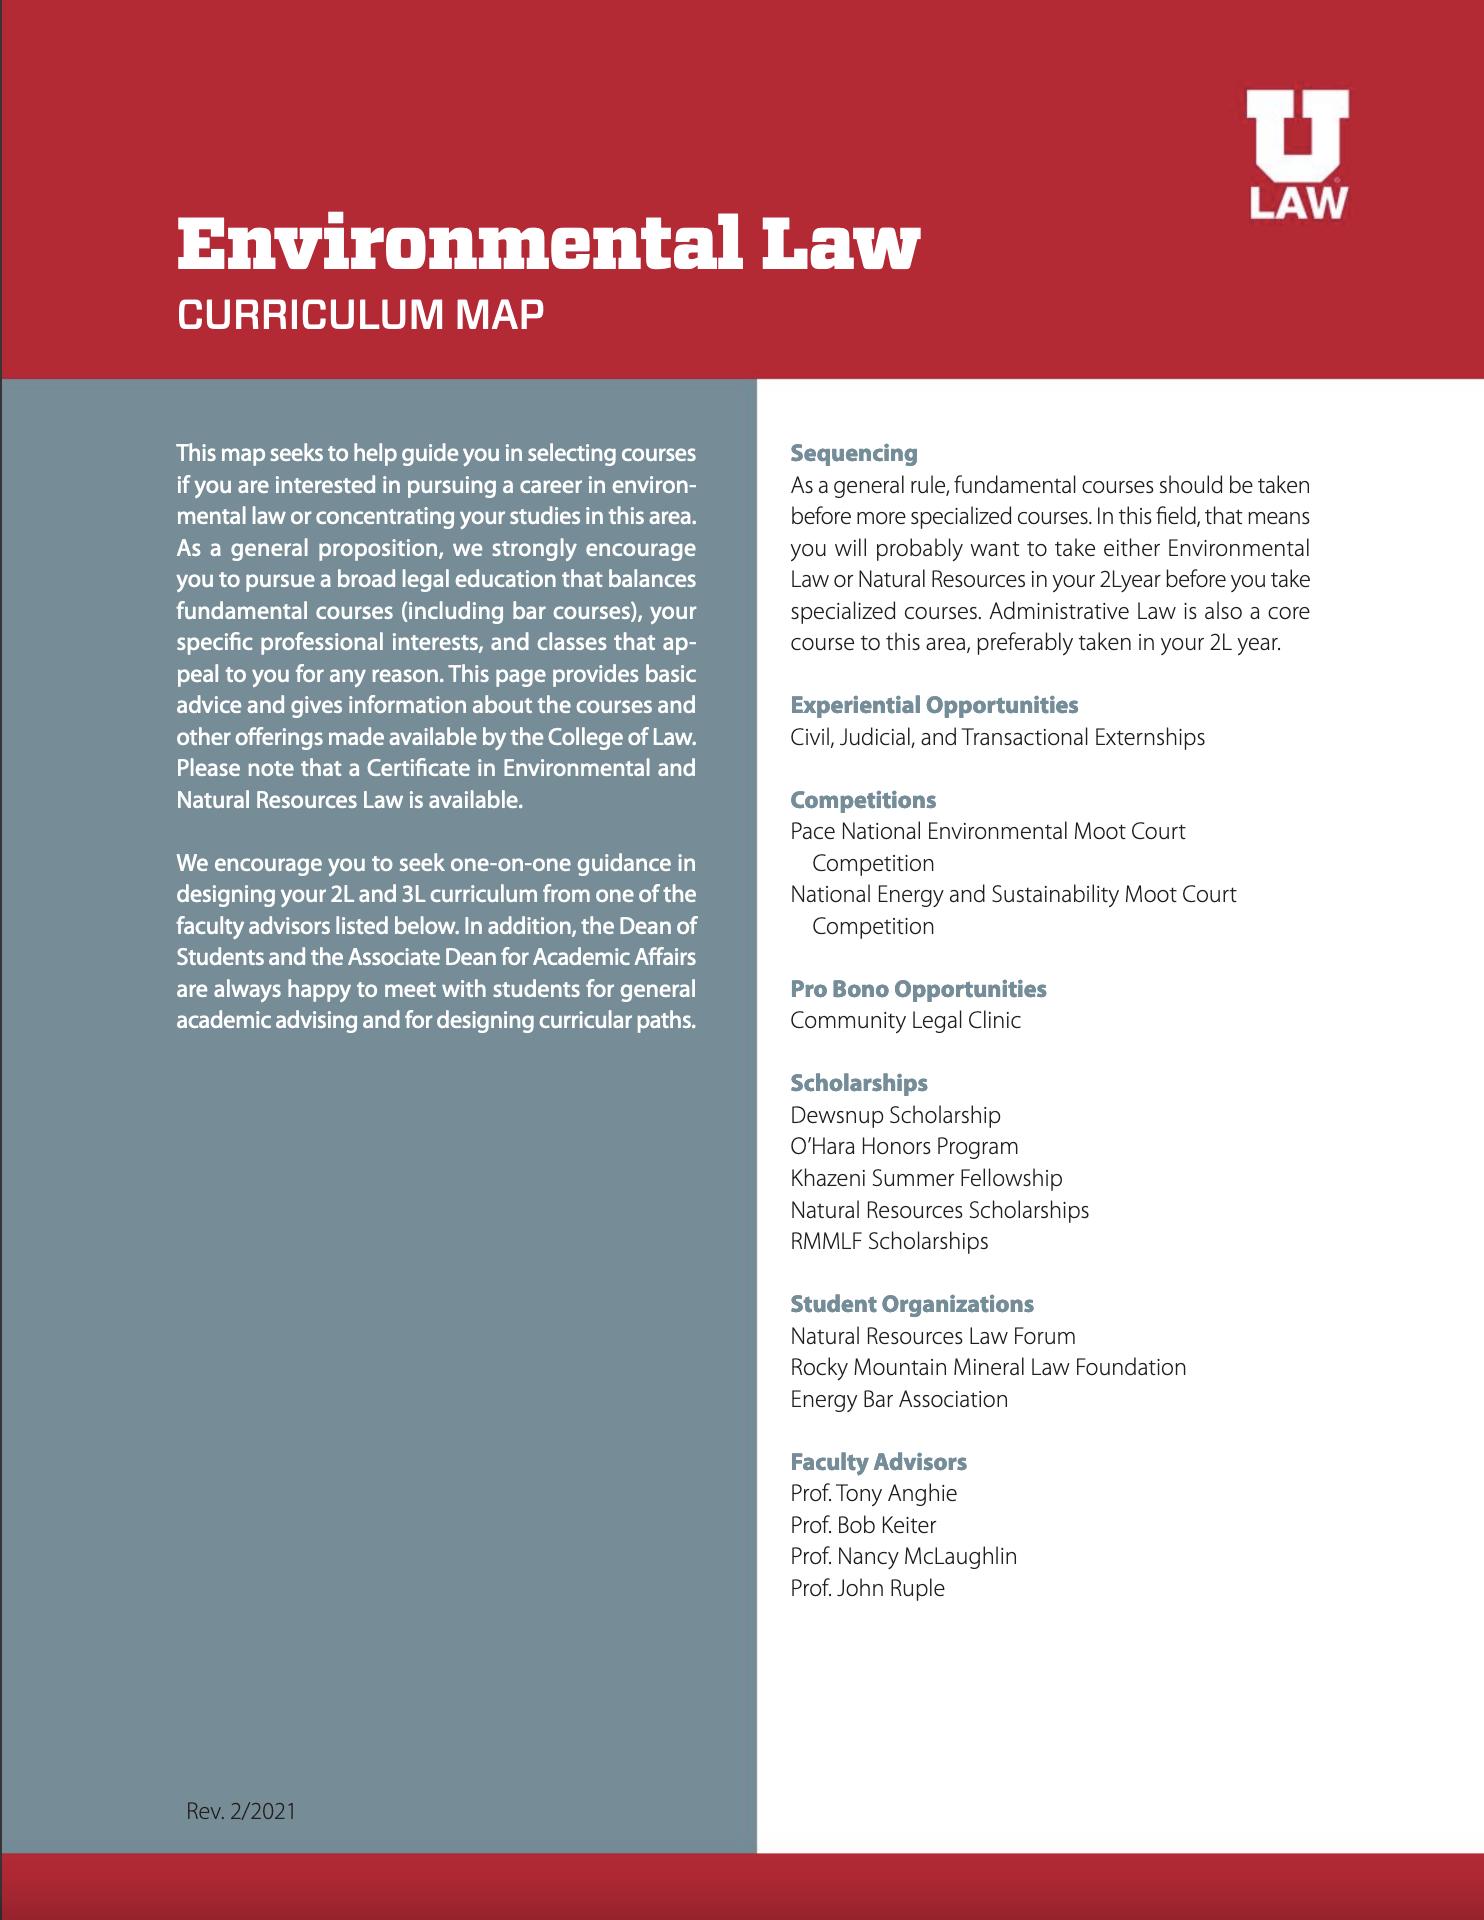 Environmental Law Curriculum Map